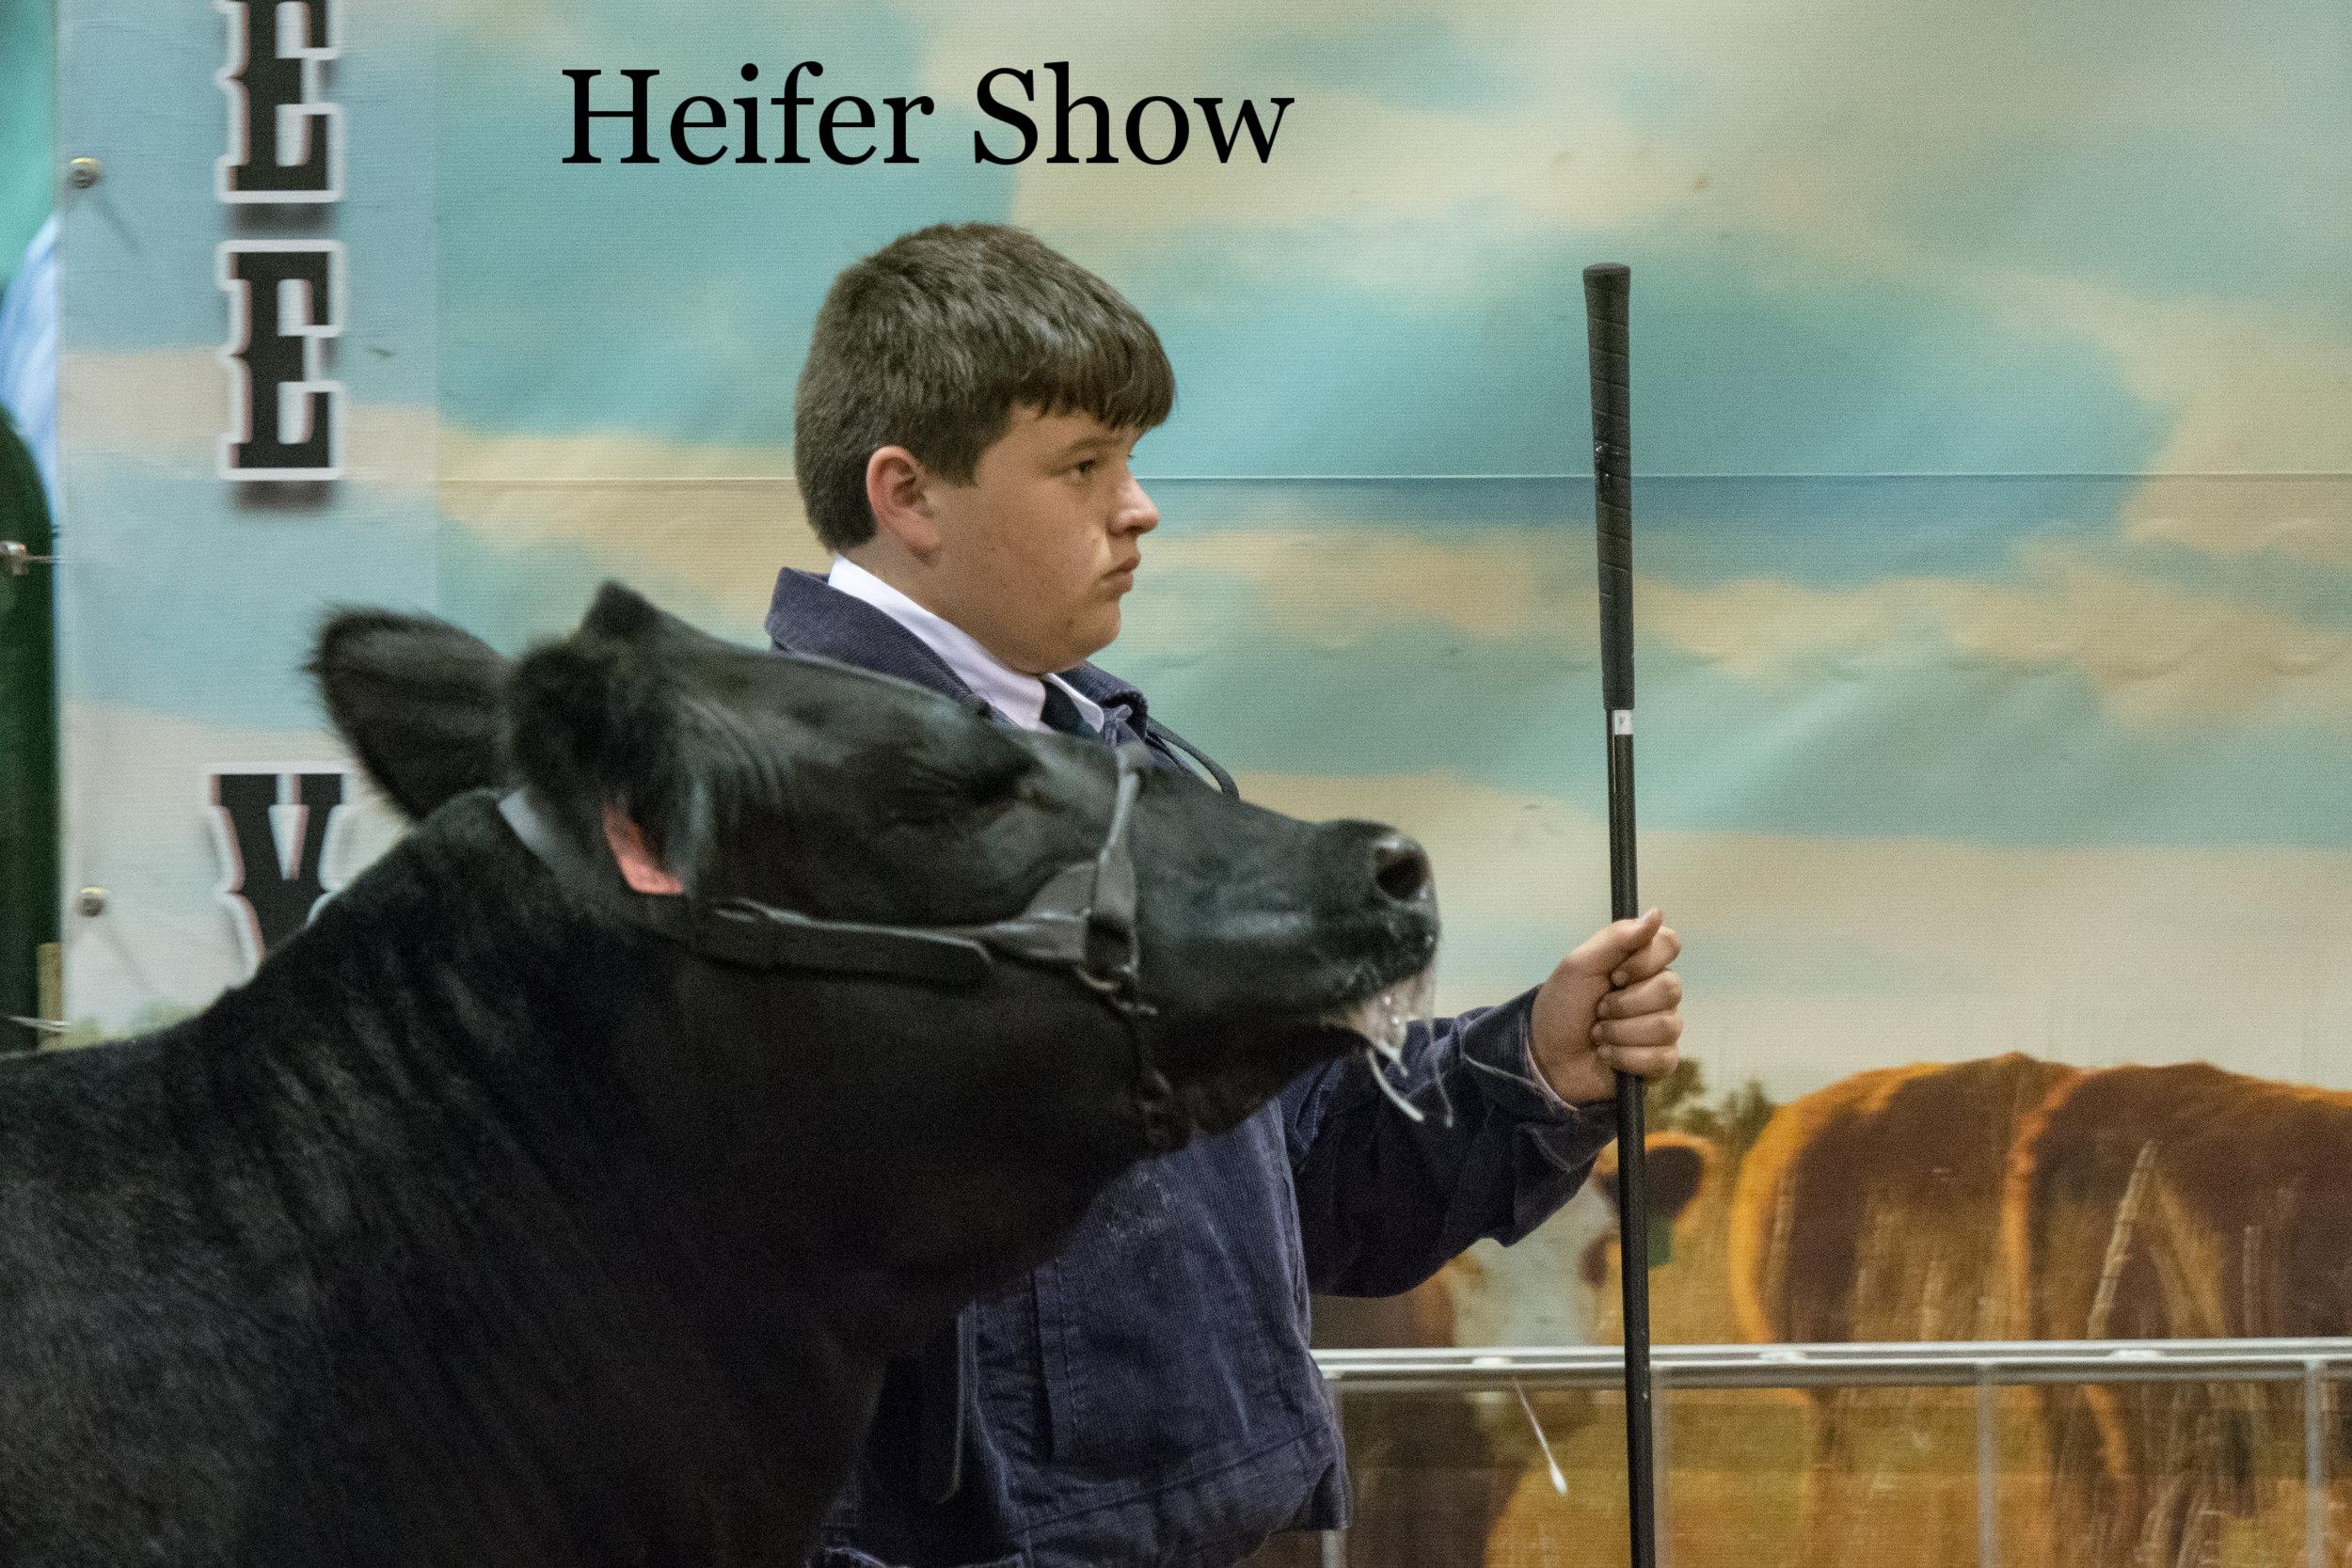 HCF2018 Heifer Show